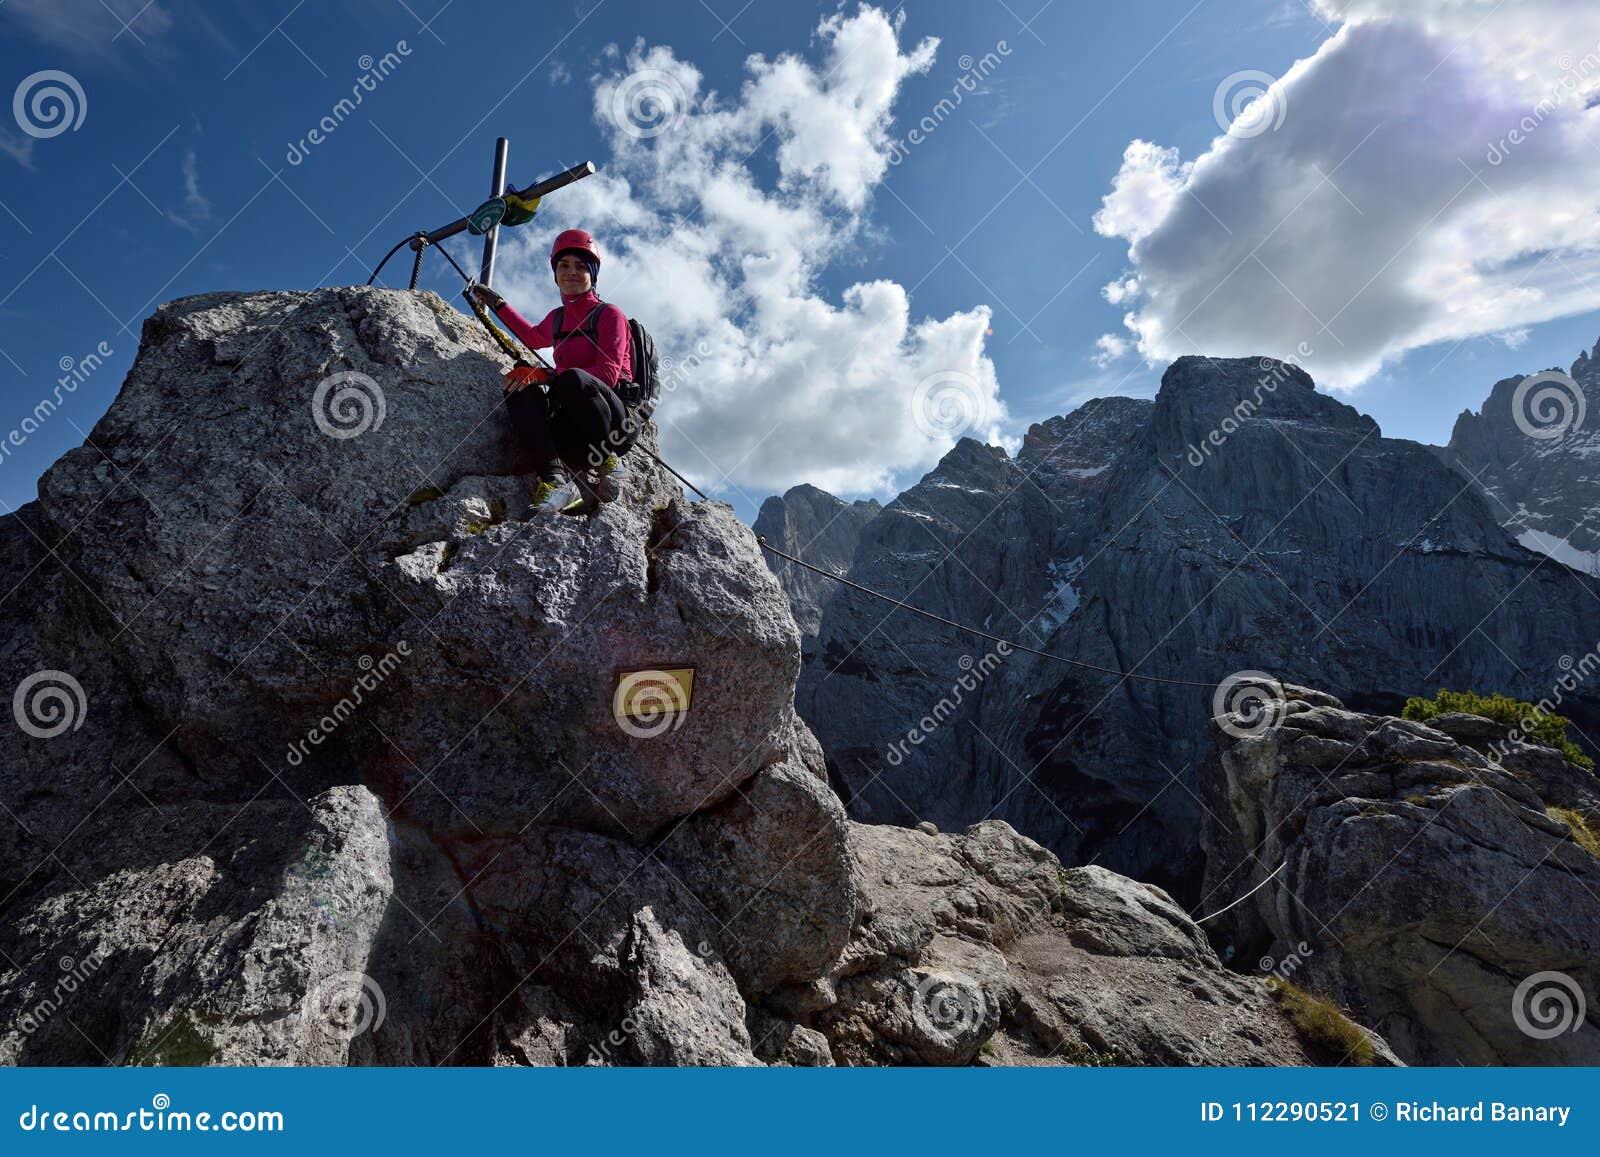 Klettersteig Austria : Hundskopf klettersteig zahmer kaiser tirol austria editorial